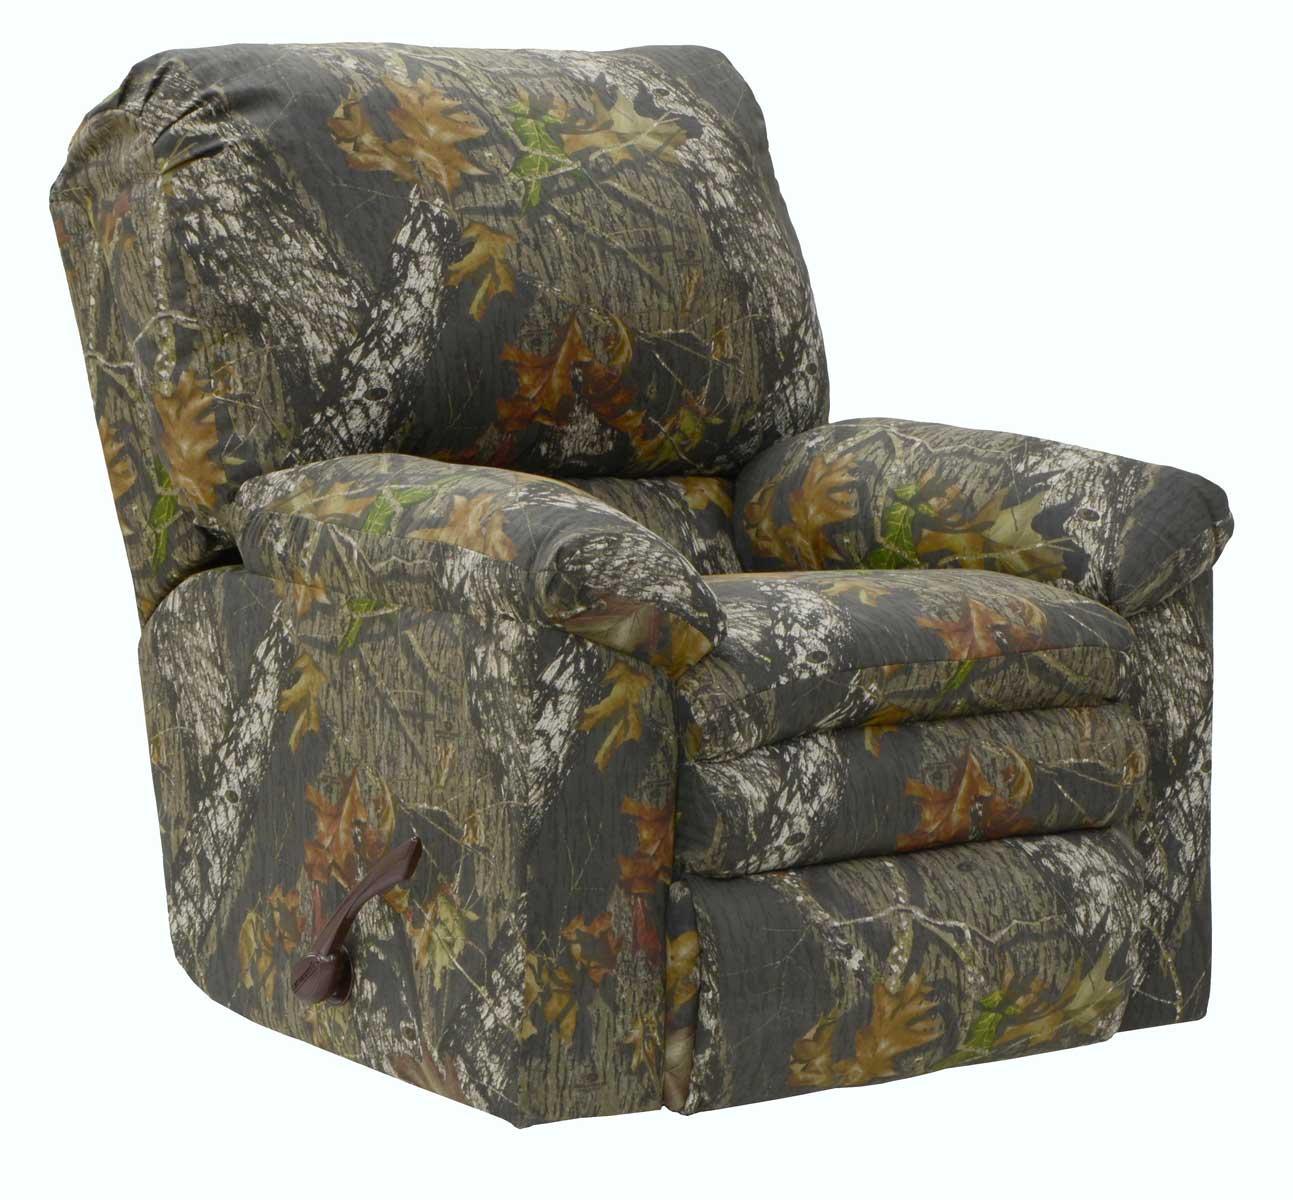 Catnapper Duck Dynasty Trapper Reclining Sofa Set Mossy